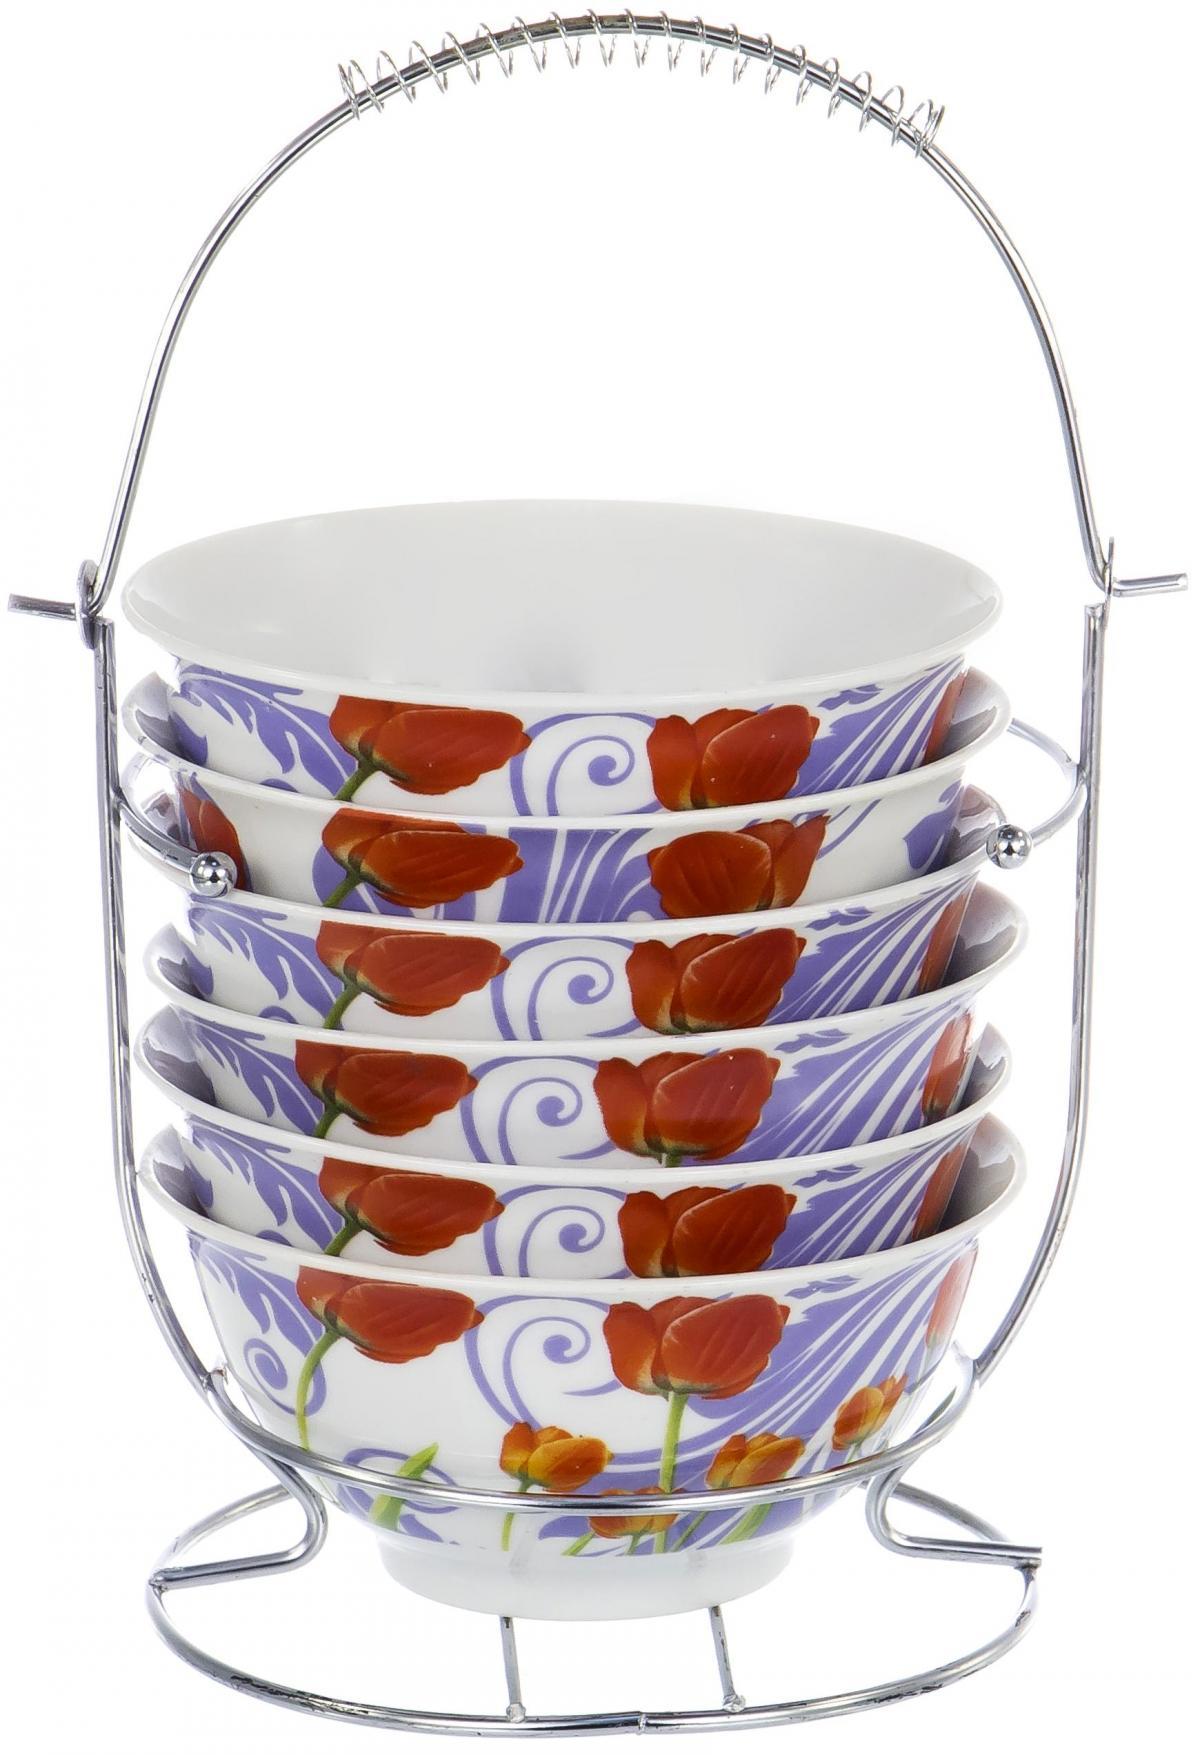 Набор салатников Olaff Bowl Set, 6 предметов. DL-BS6MS-156DL-BS6MS-156BOWL SET, набор (6) 6 салатников 300мл на метал.стенде, подарочная упаковка